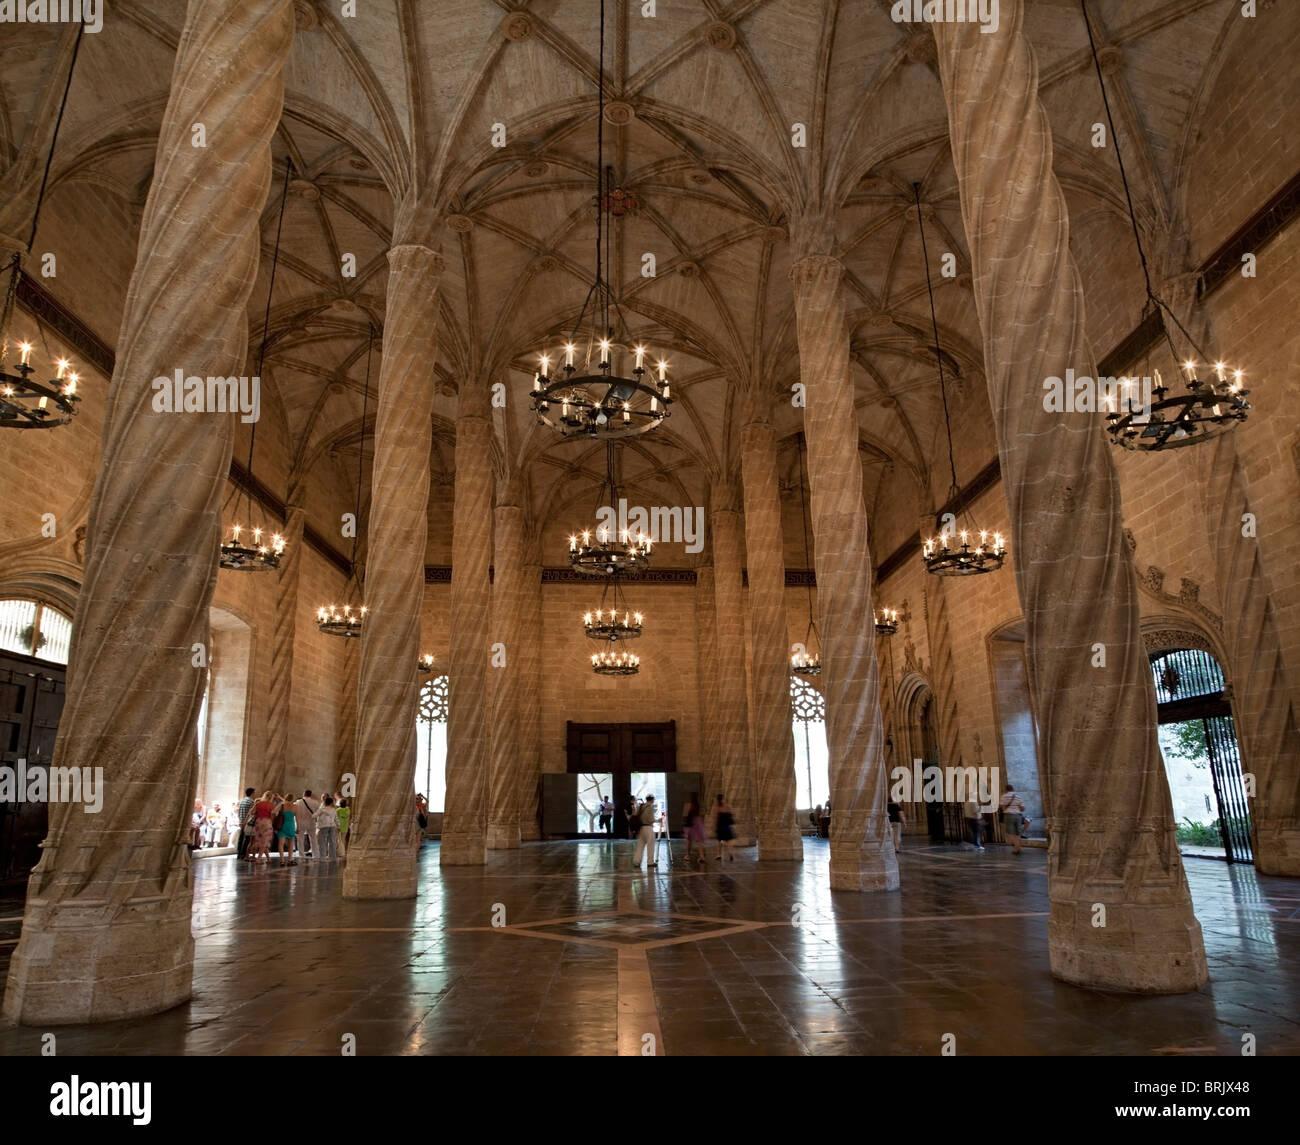 Valencia Seide Börsengebäude, Vertrag, Hall, World Heritage, Decke ...